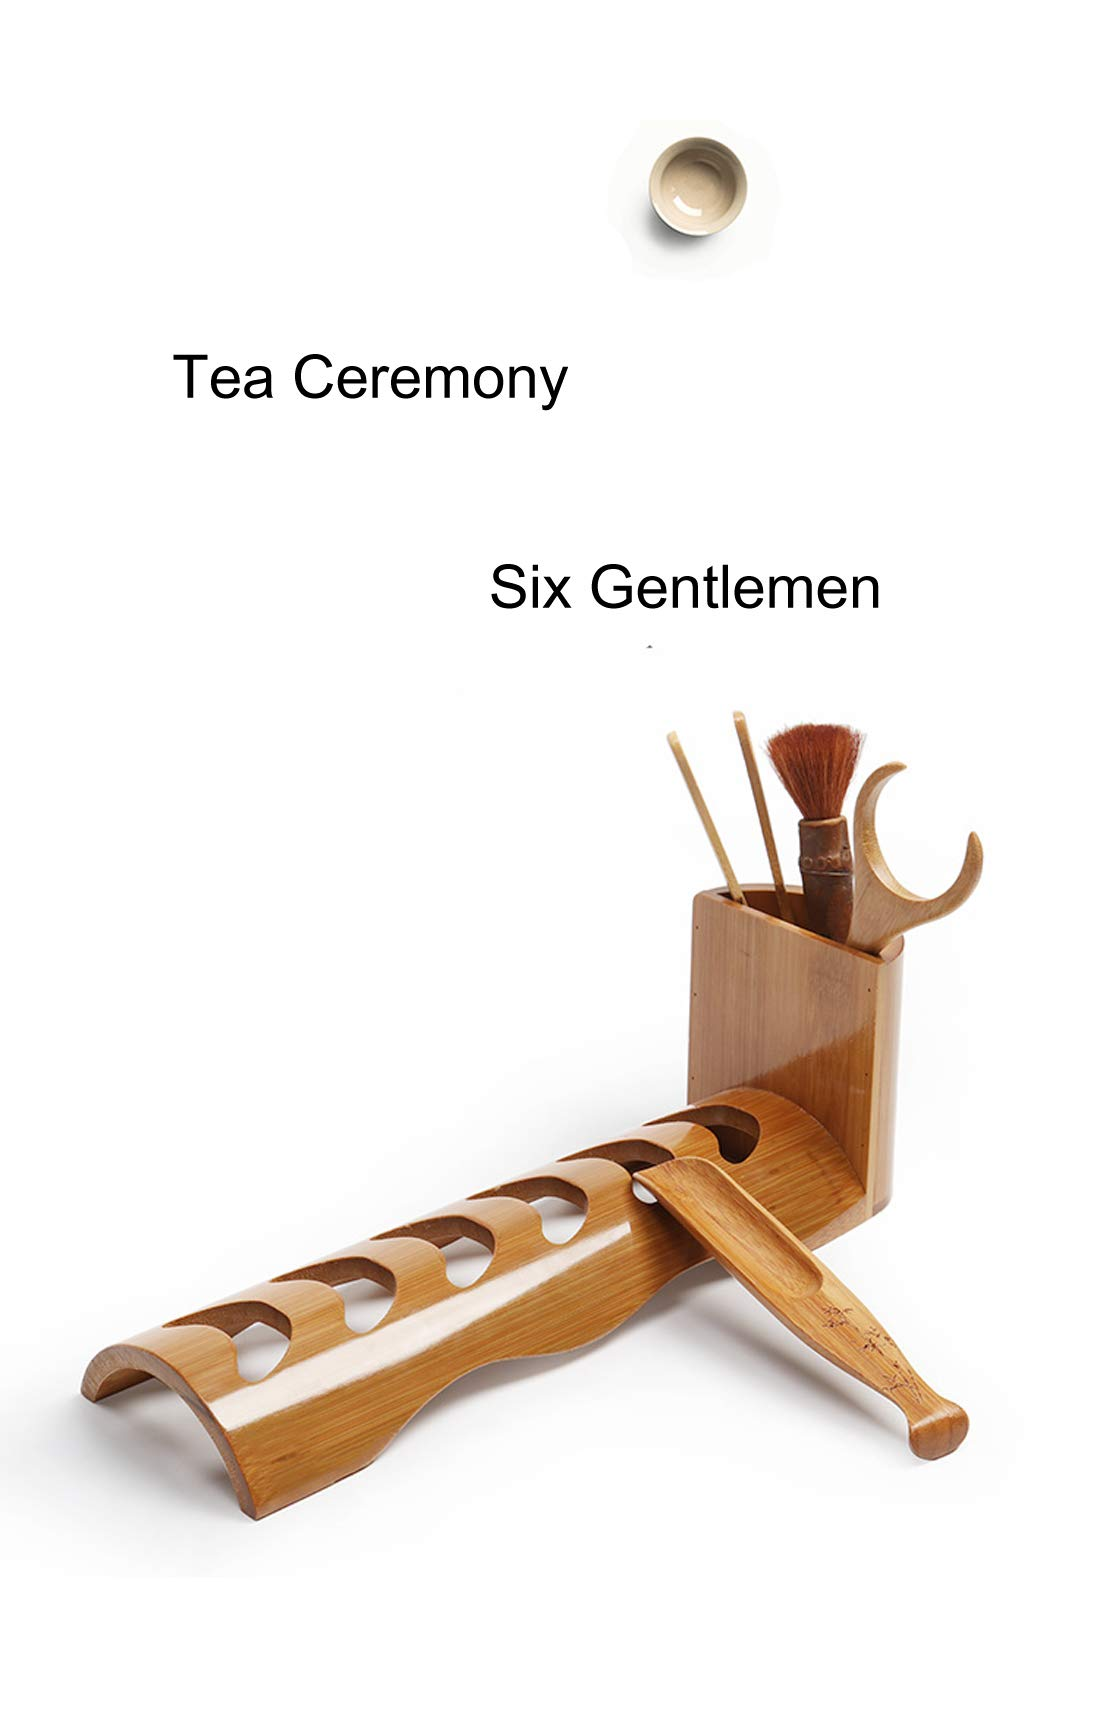 Lan Bo Tea Ceremony Six Gentlemen Tea Clip Set Tea Knife Tea Set Accessories Tea Spoon Cup Fork Home Decoration